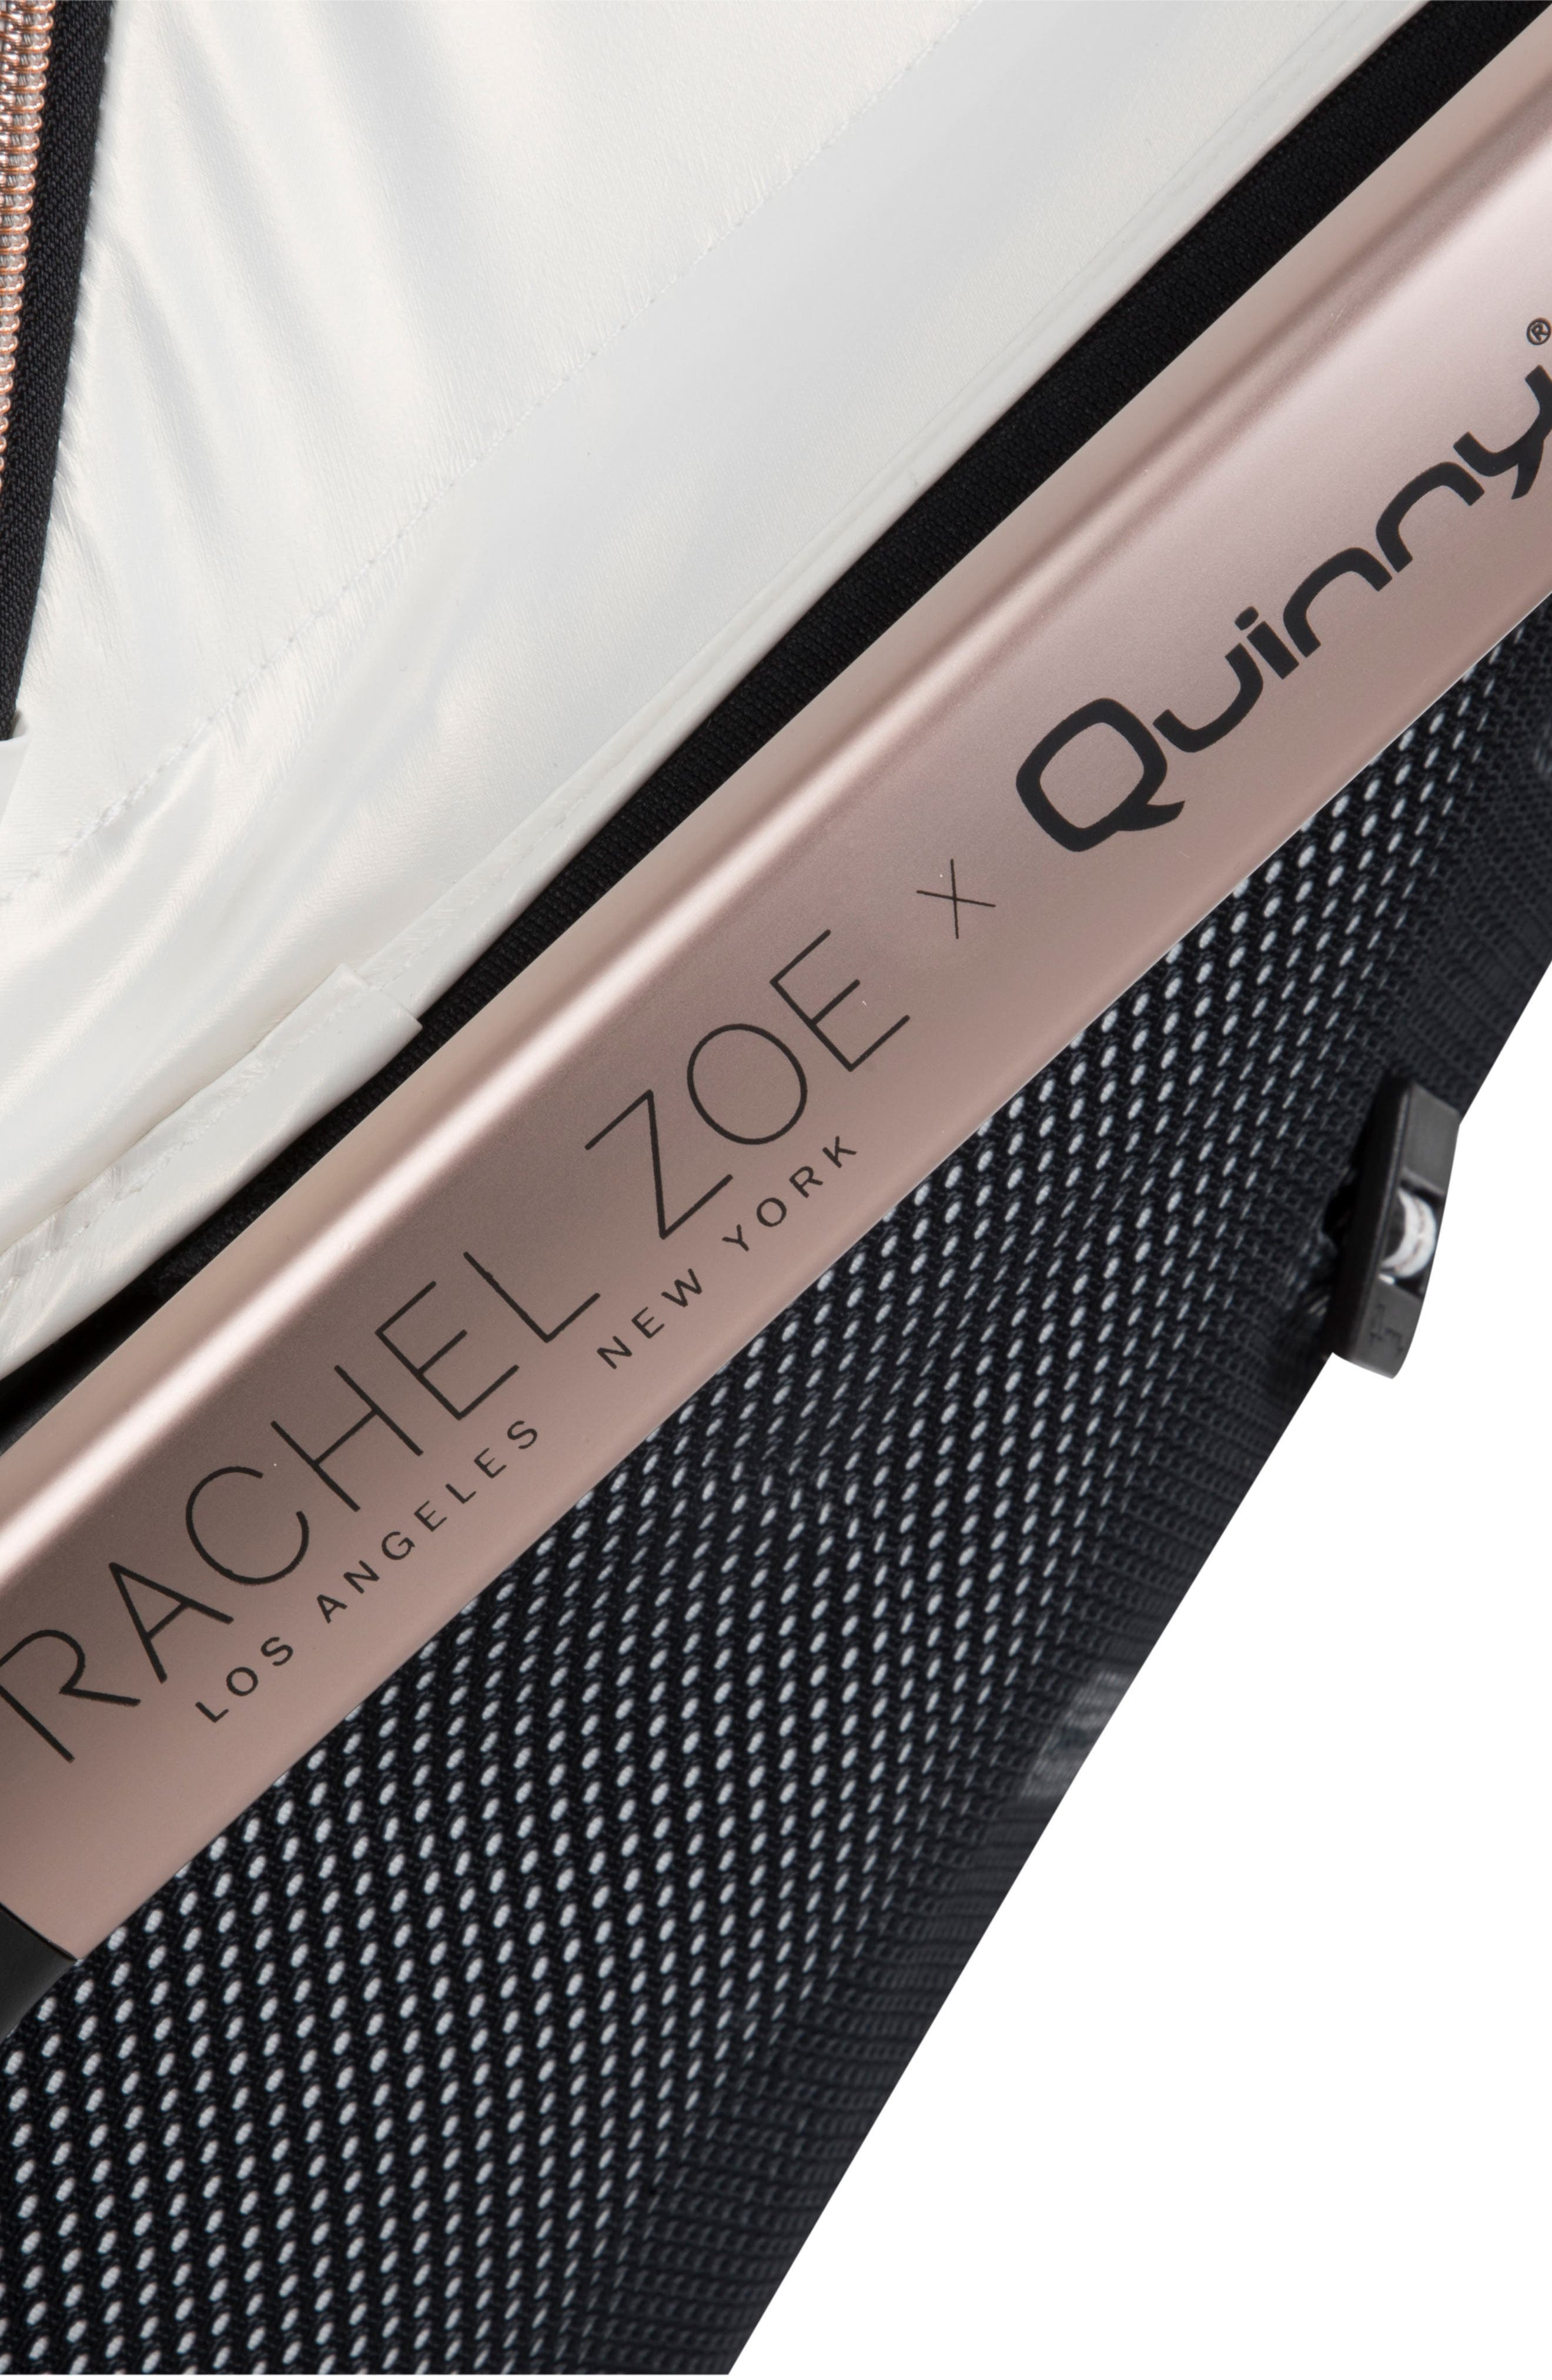 x Rachel Zoe Zapp Flex Luxe Sport Stroller,                             Alternate thumbnail 13, color,                             Rz Luxe Sport